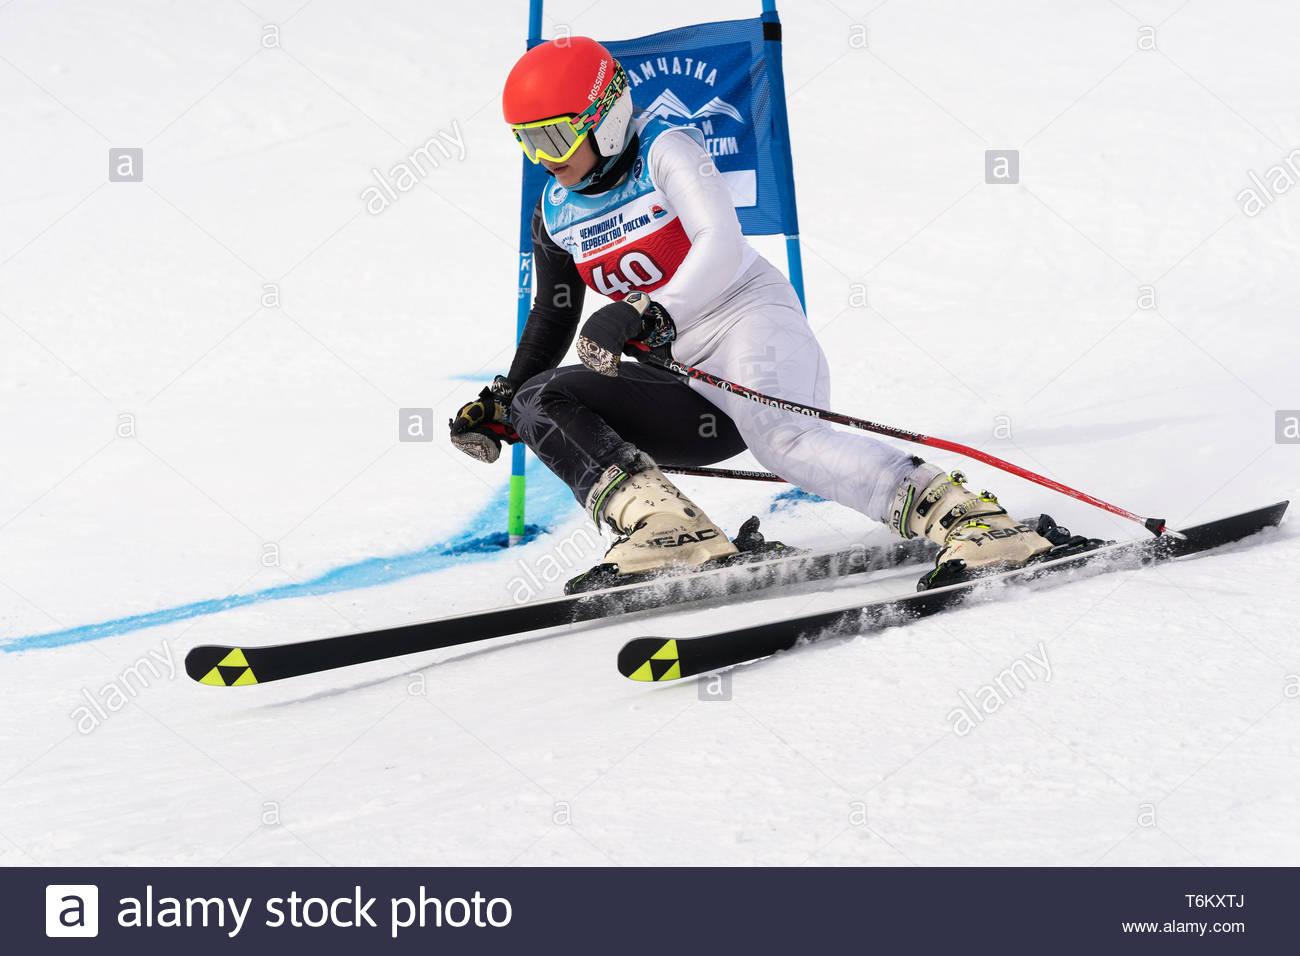 KAMCHATKA, RUSSIA - APRIL 2, 2019: Mountain skier Ekaterina Kudryavtseva (St. Petersburg) skiing down mount. Russian Women's Alpine Skiing Cup, Intern - Stock Image